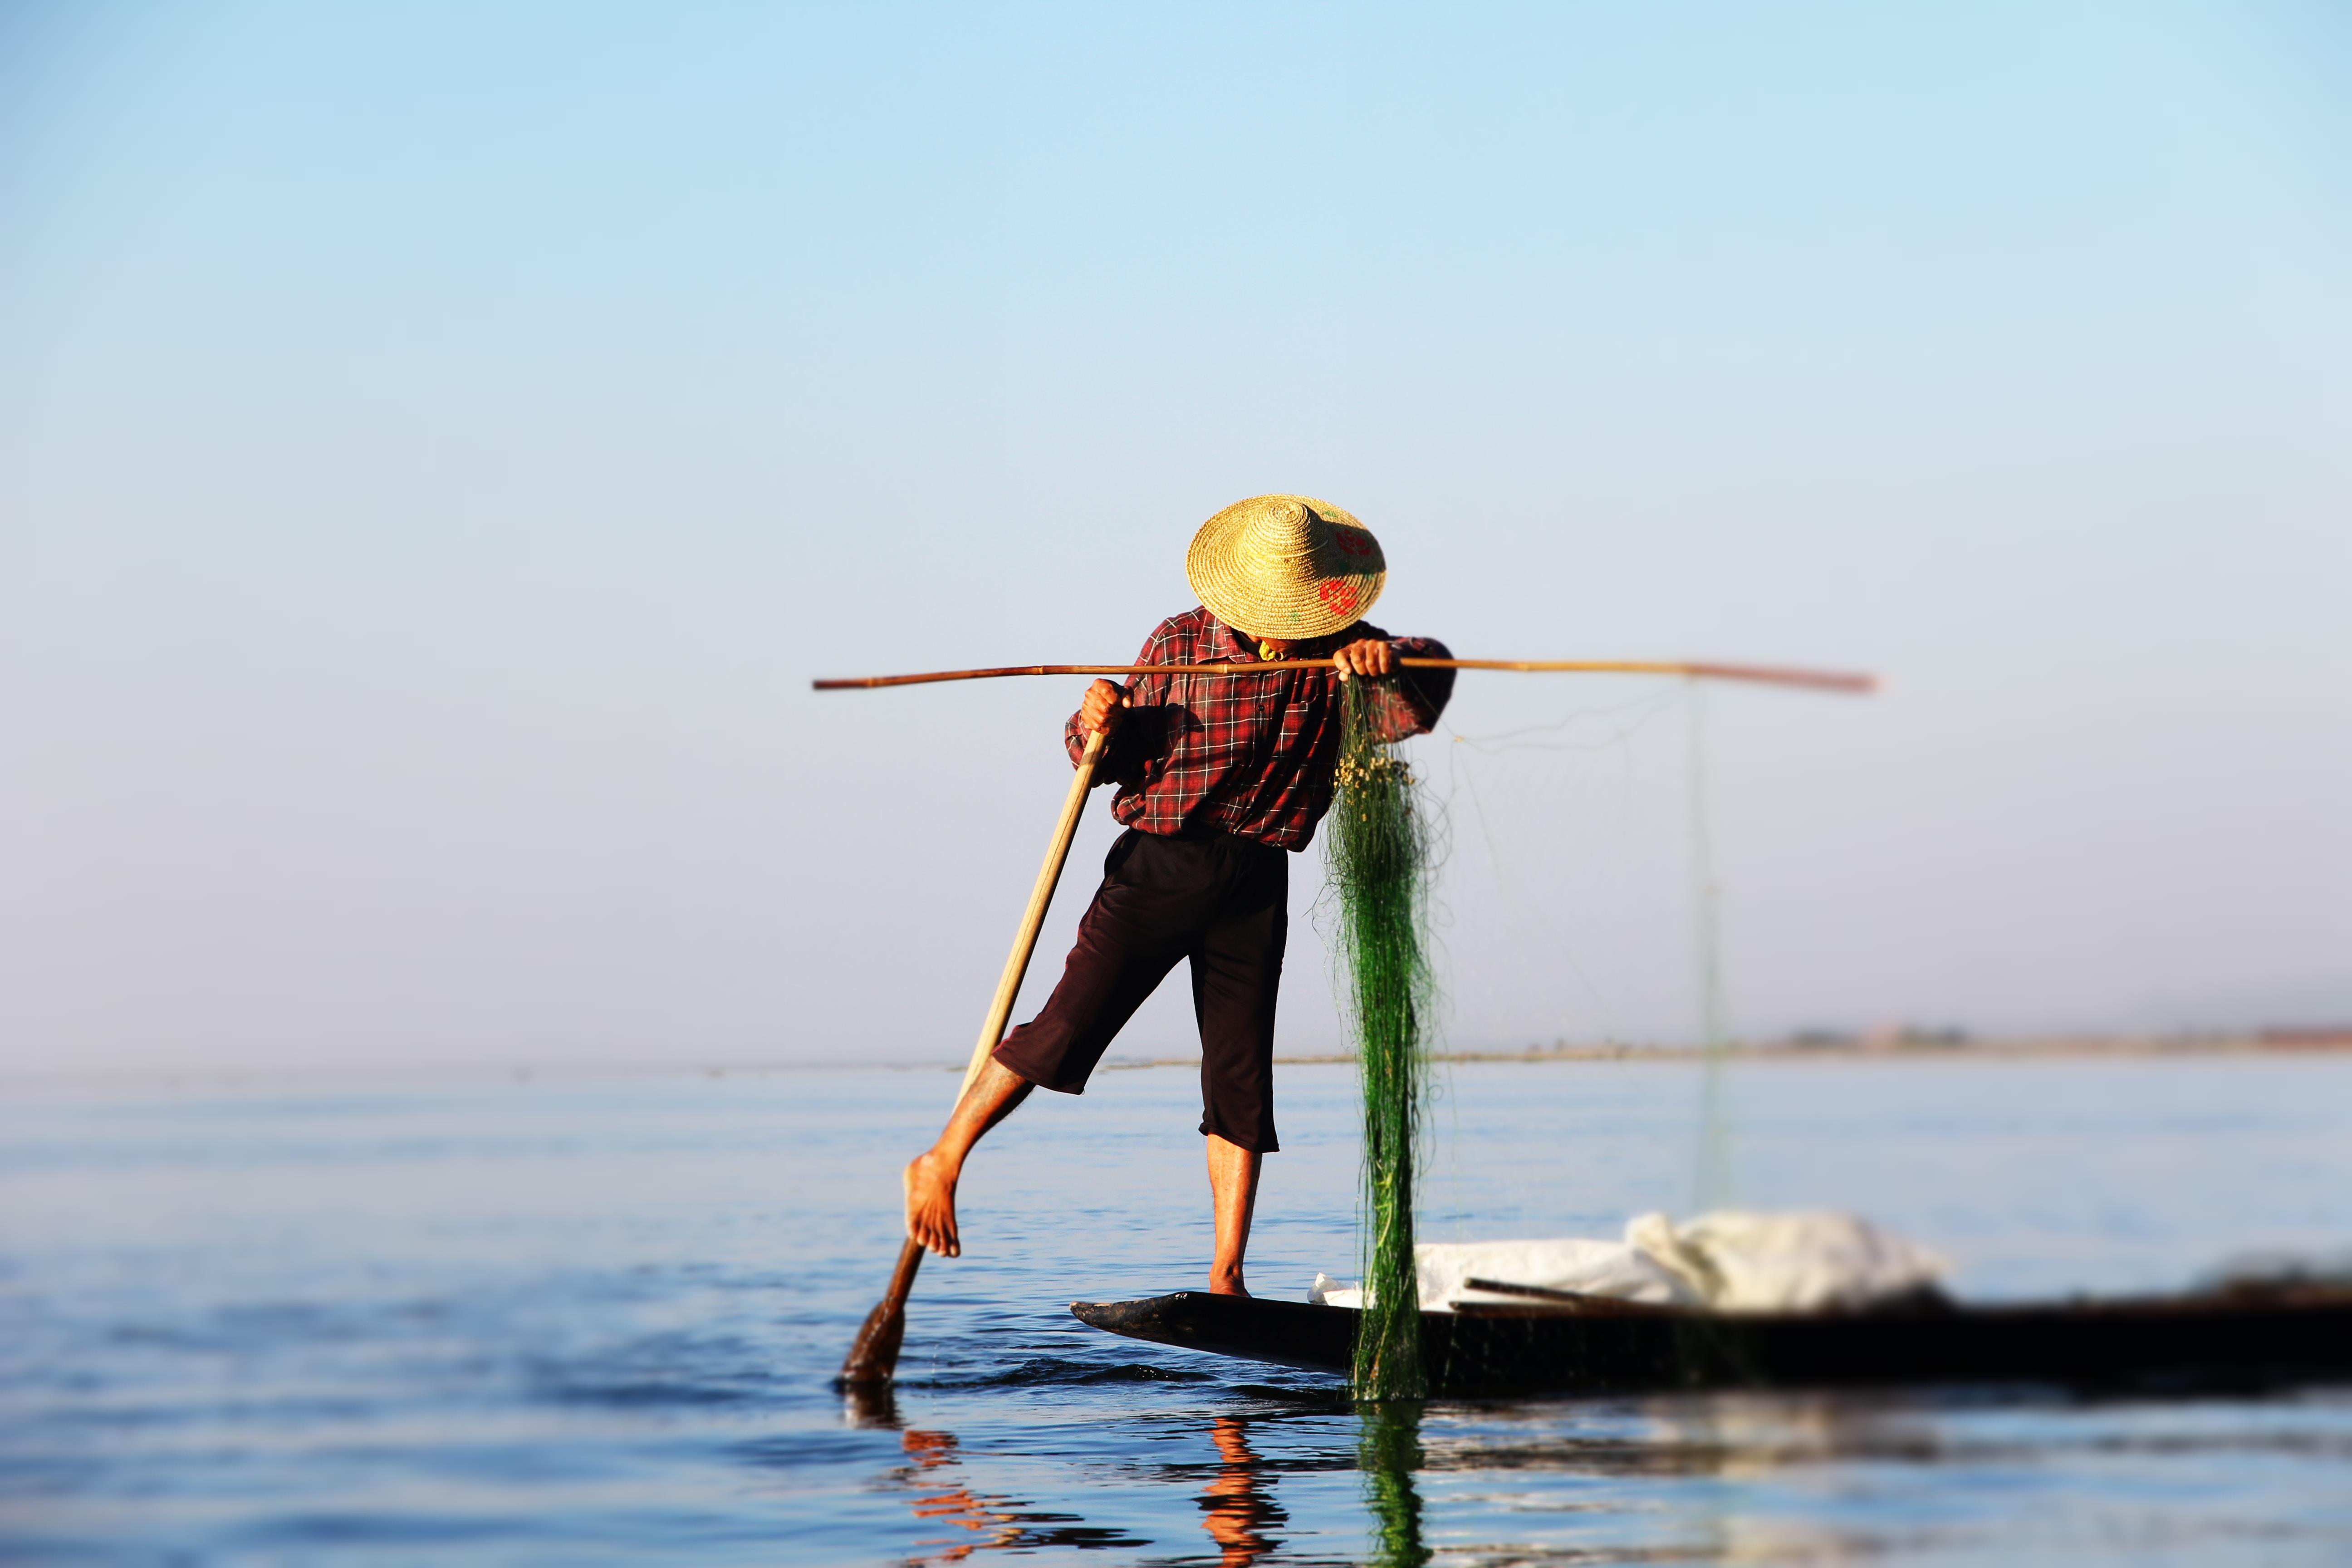 man on boat holding stick